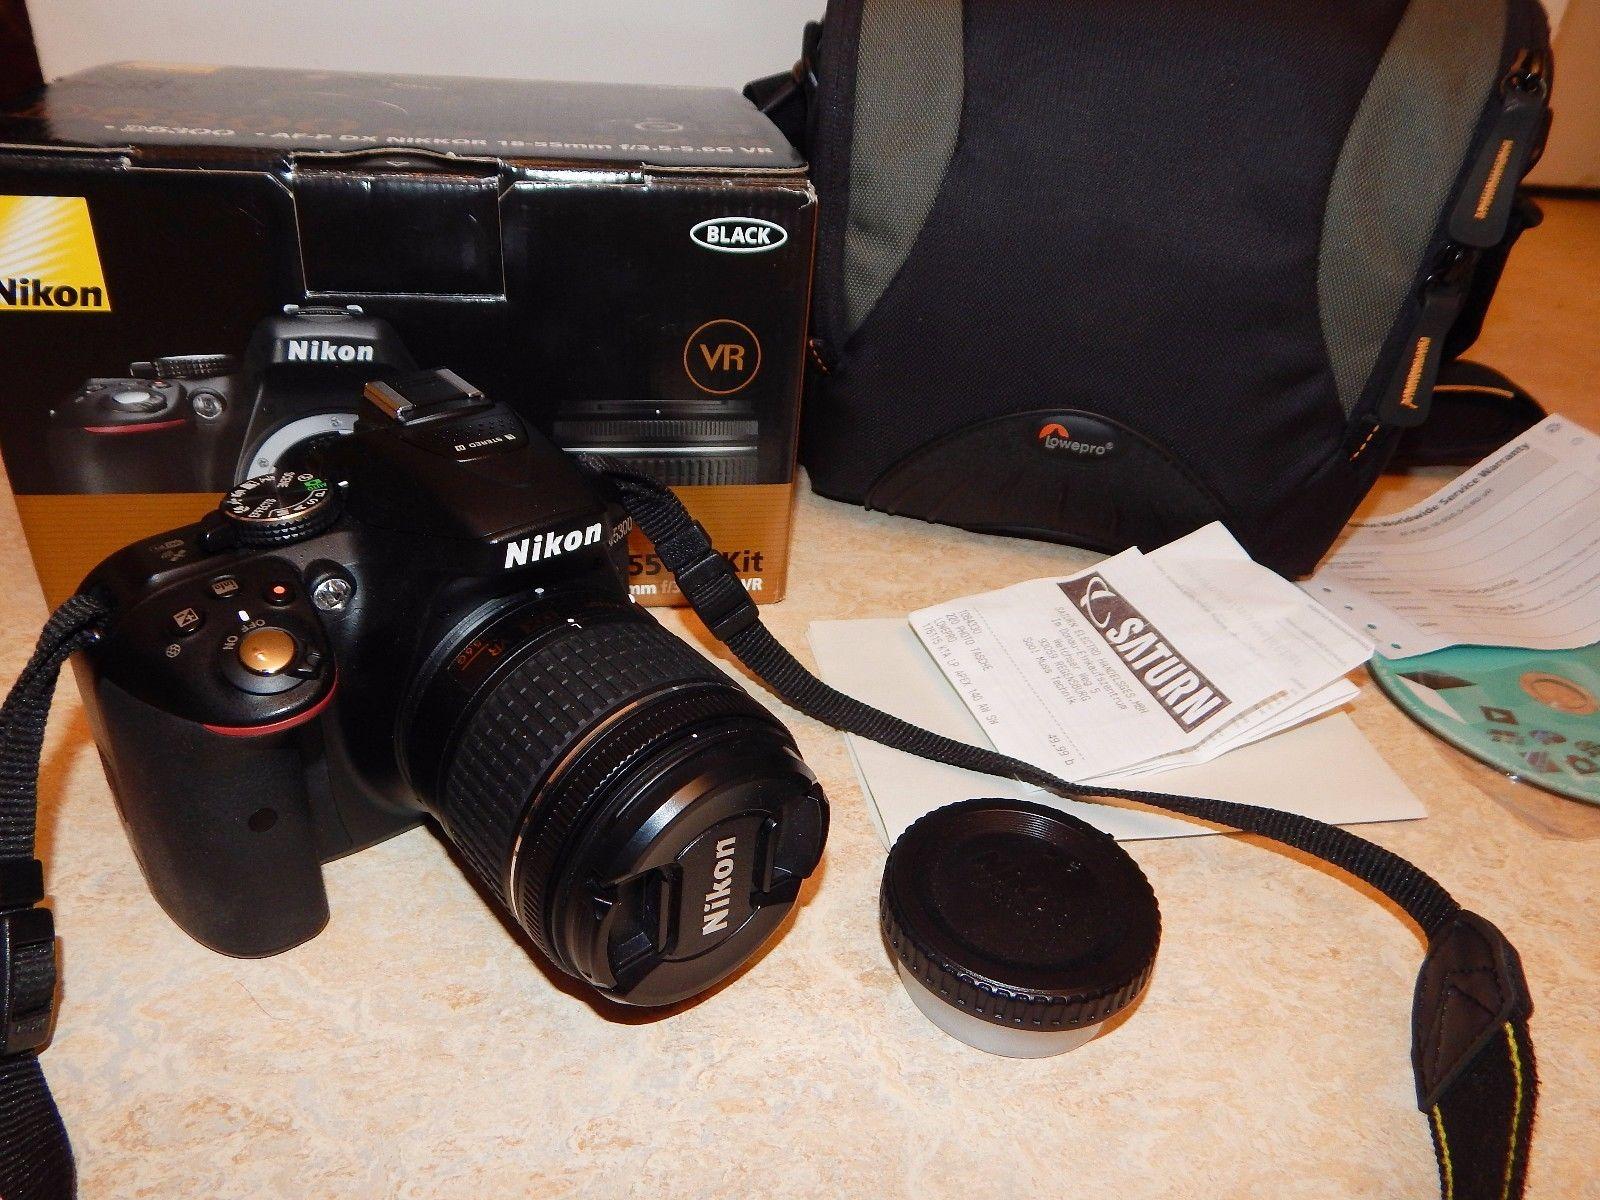 Wie Neu! Nikon D 5300 24.2MP Digitalkamera Schwarz (mit AF-P 18-55mm Objektiv)